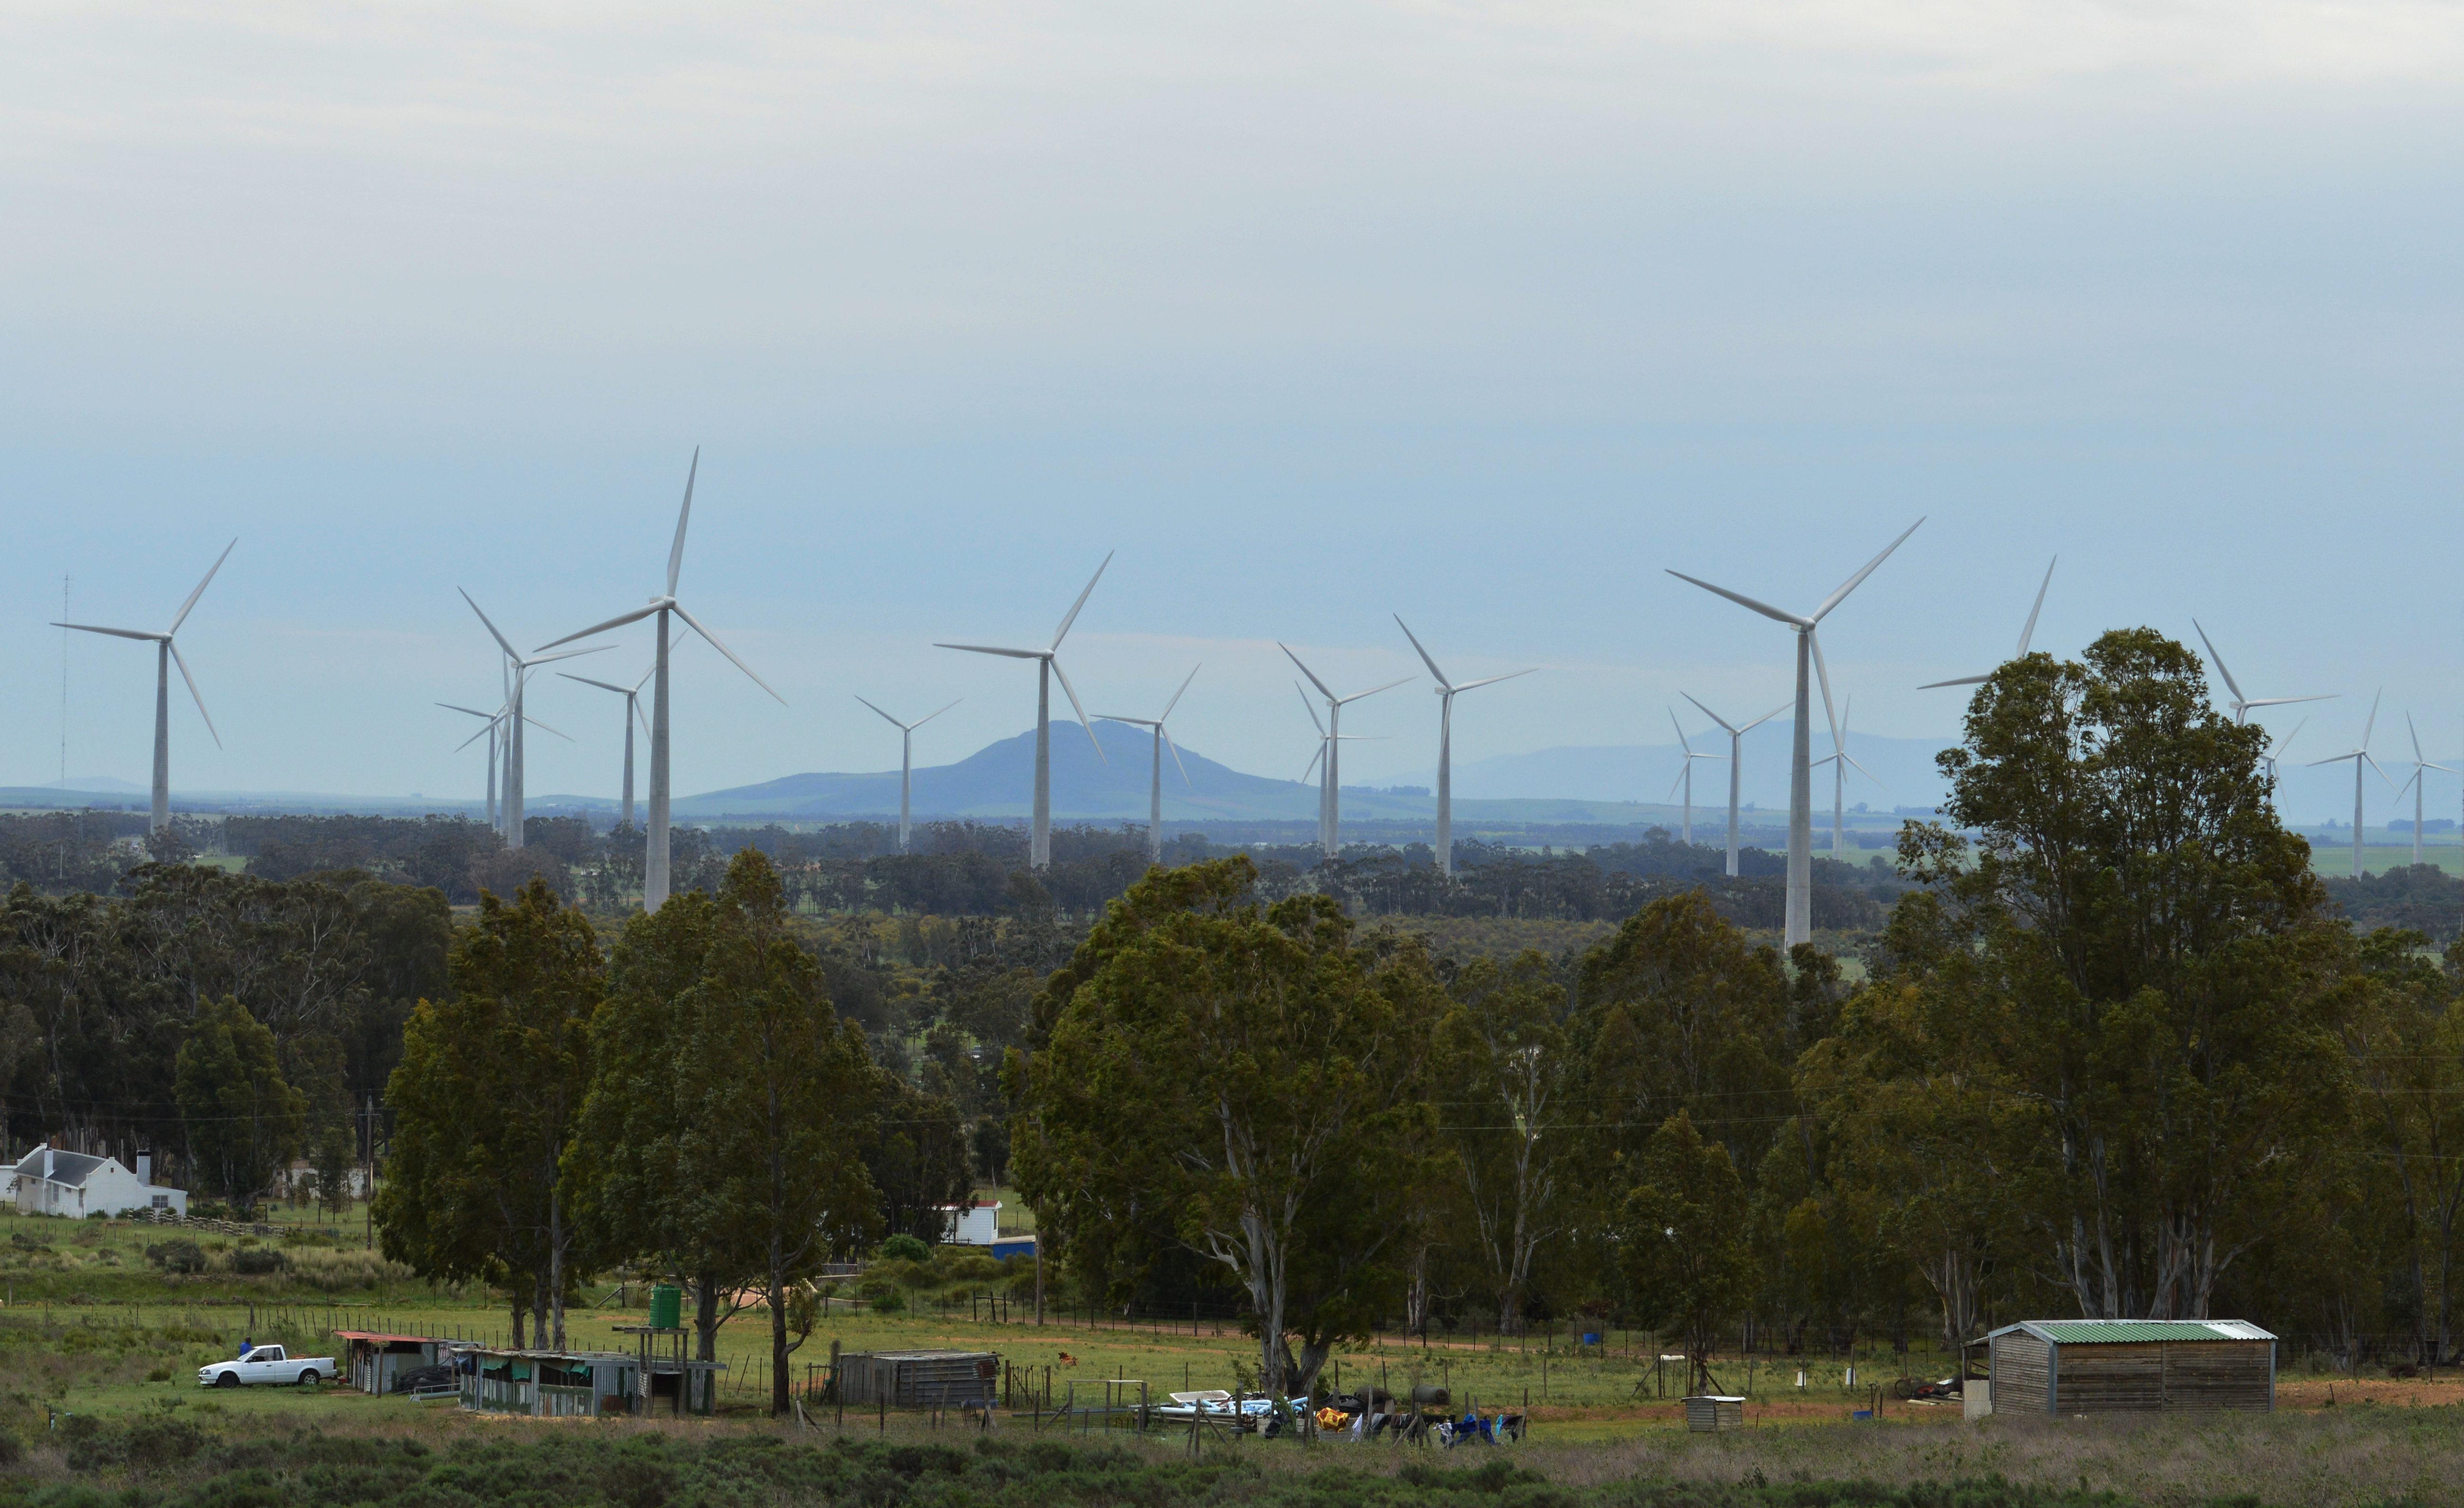 the Gouda wind farm, South Africa